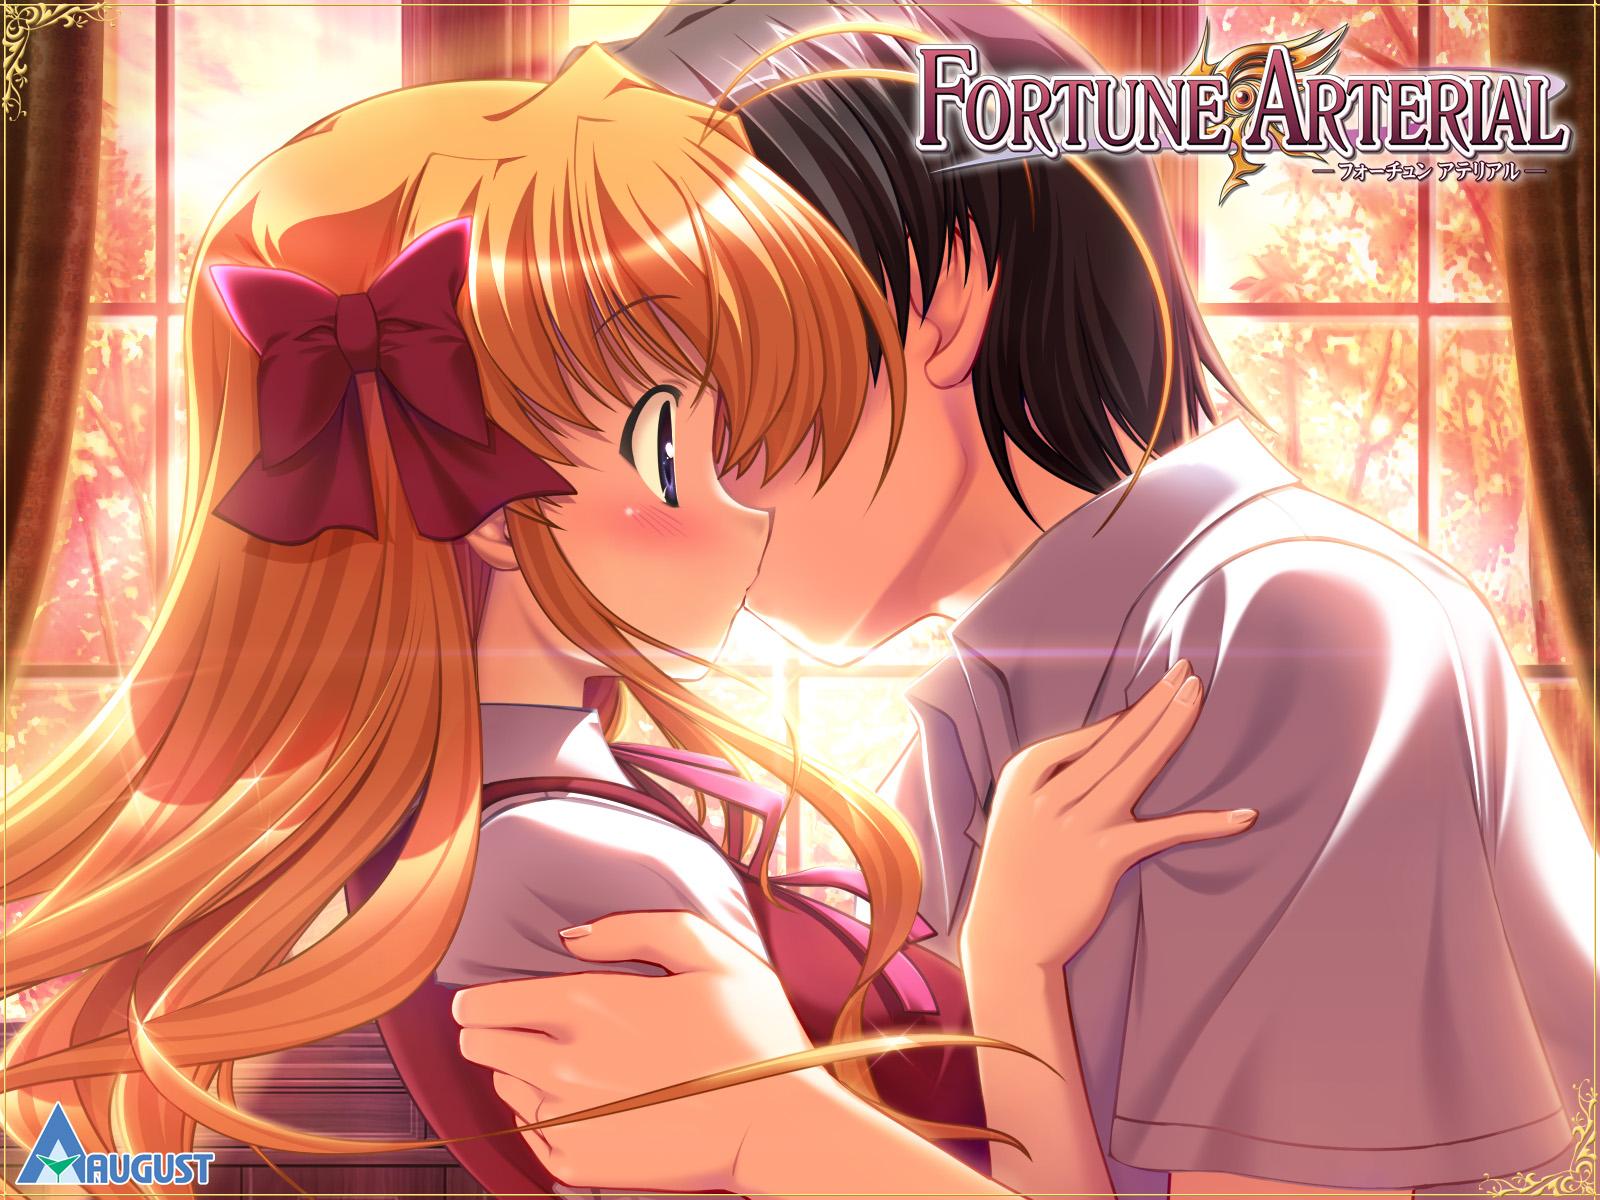 bekkankou fortune_arterial kiss sendo_erika